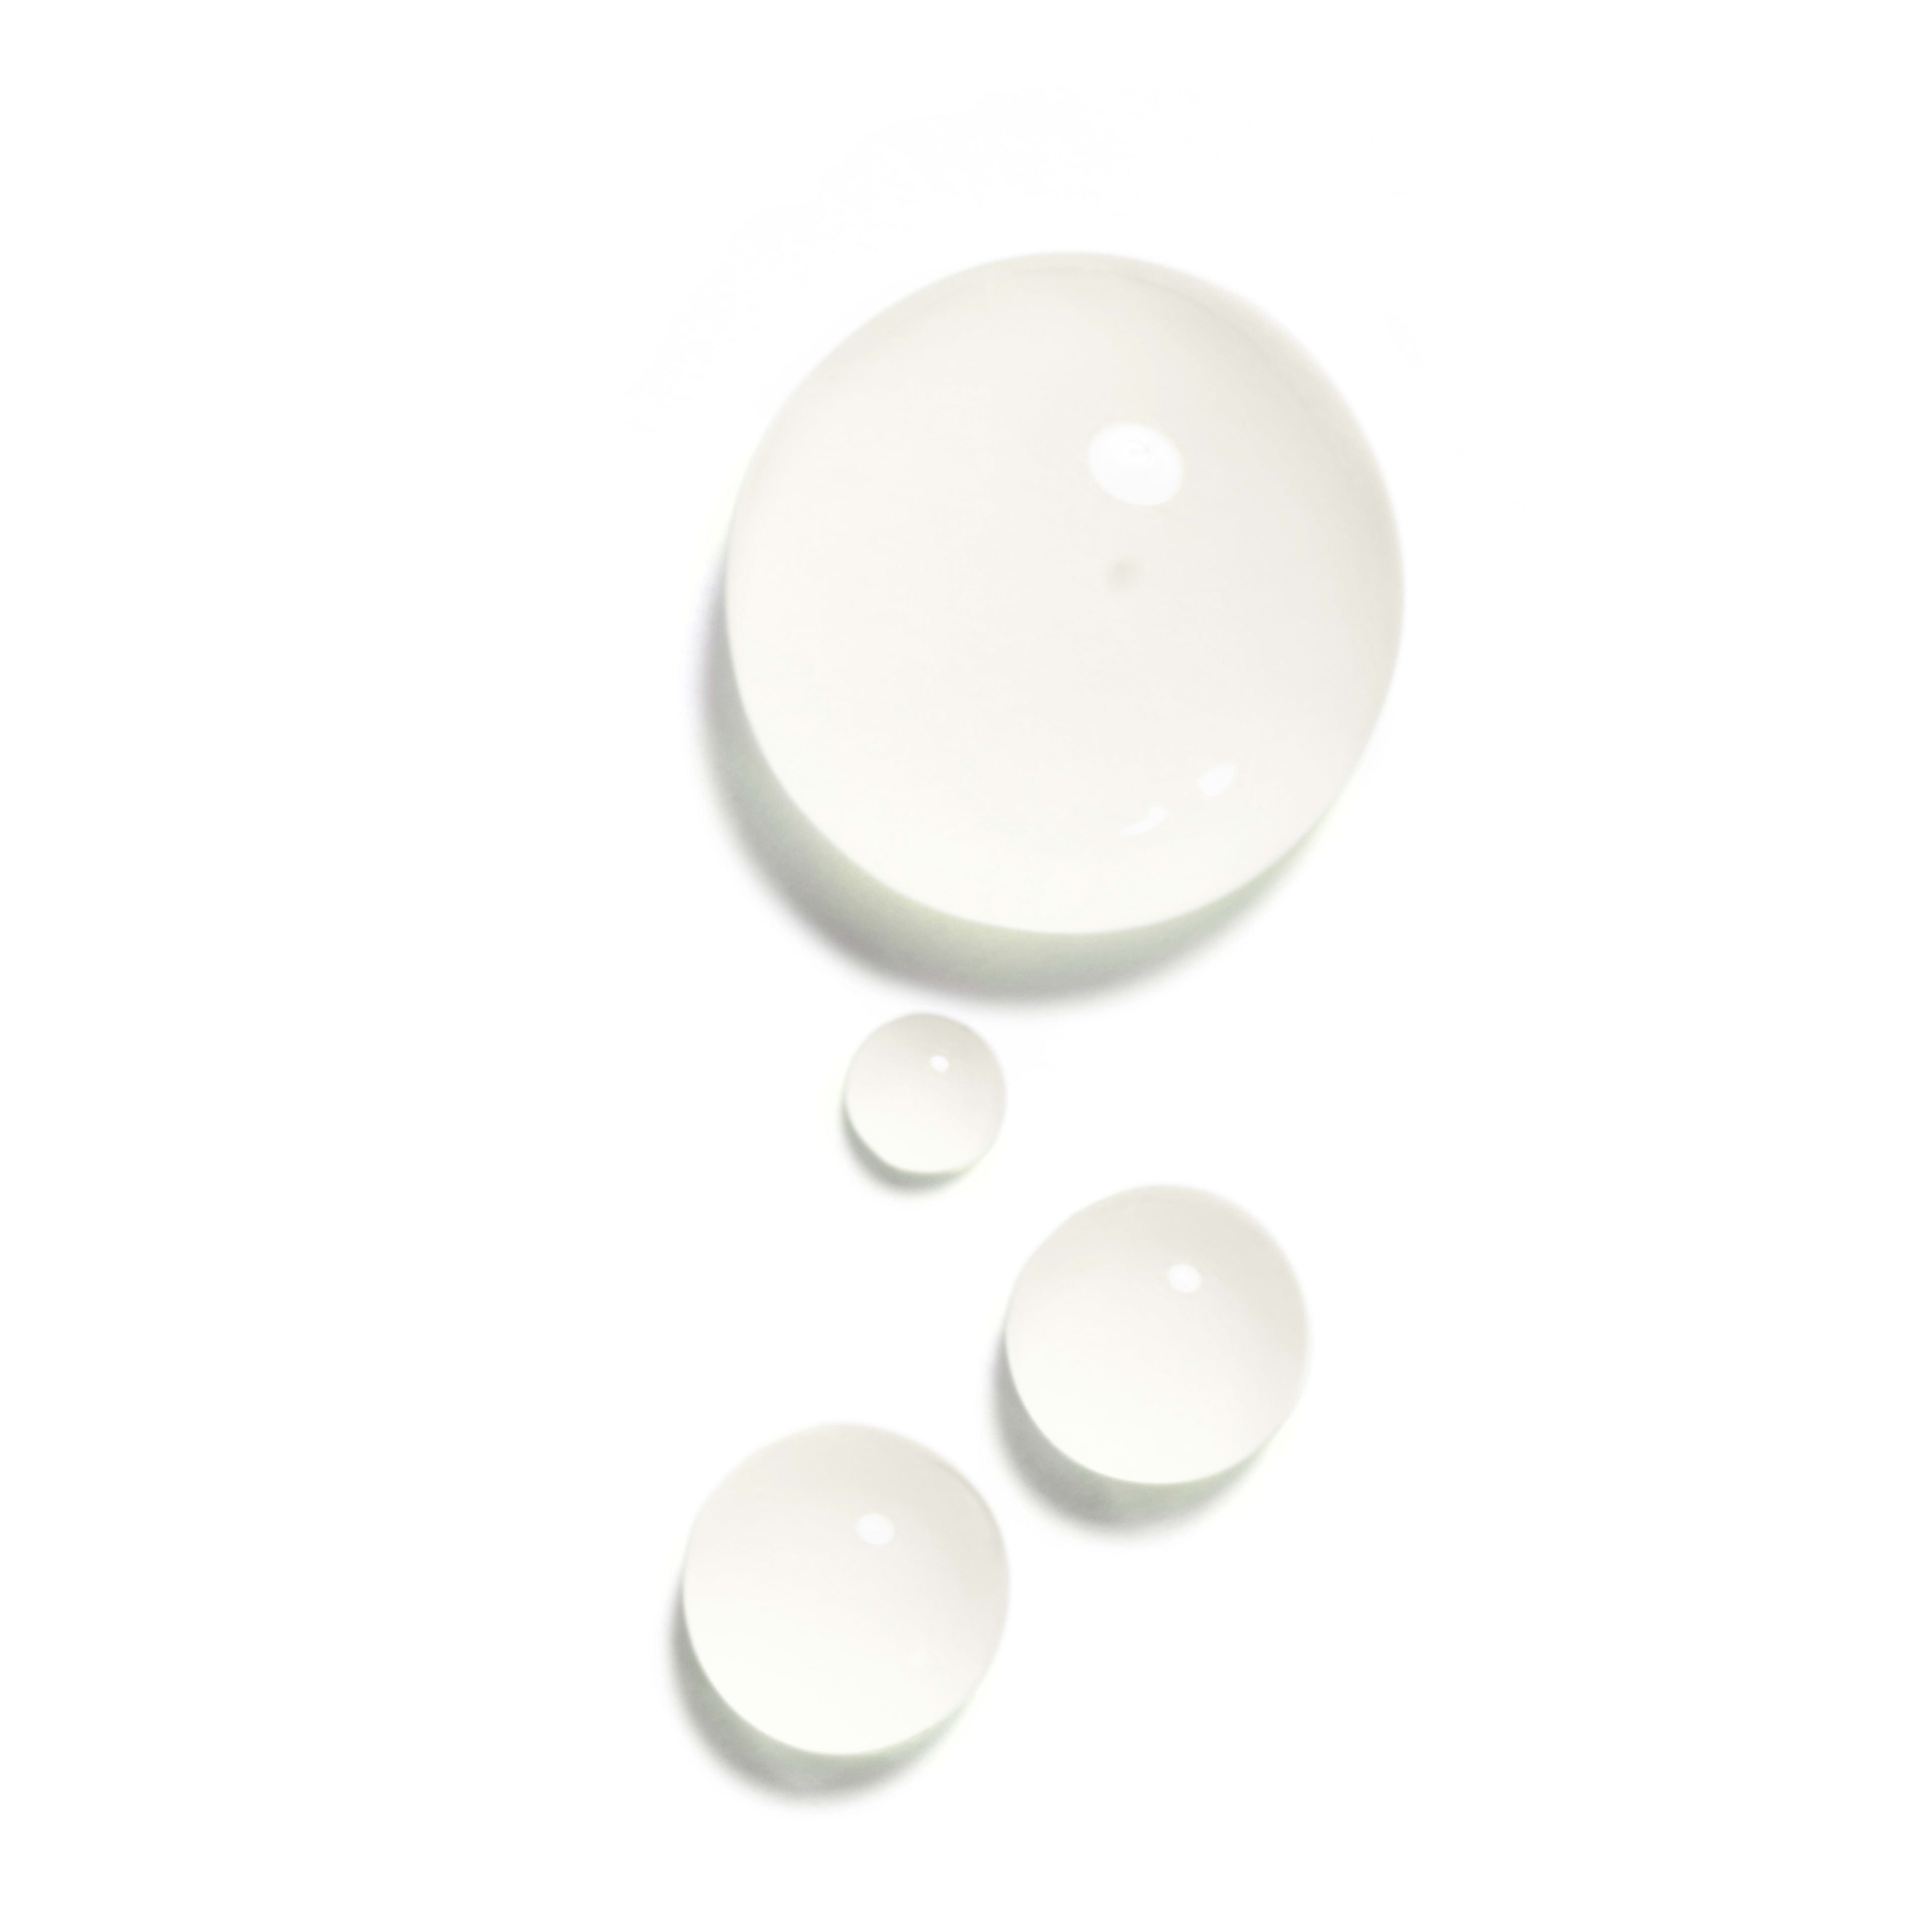 PLATINUM ÉGOÏSTE - fragrance - 3.4FL. OZ. - Basic texture view